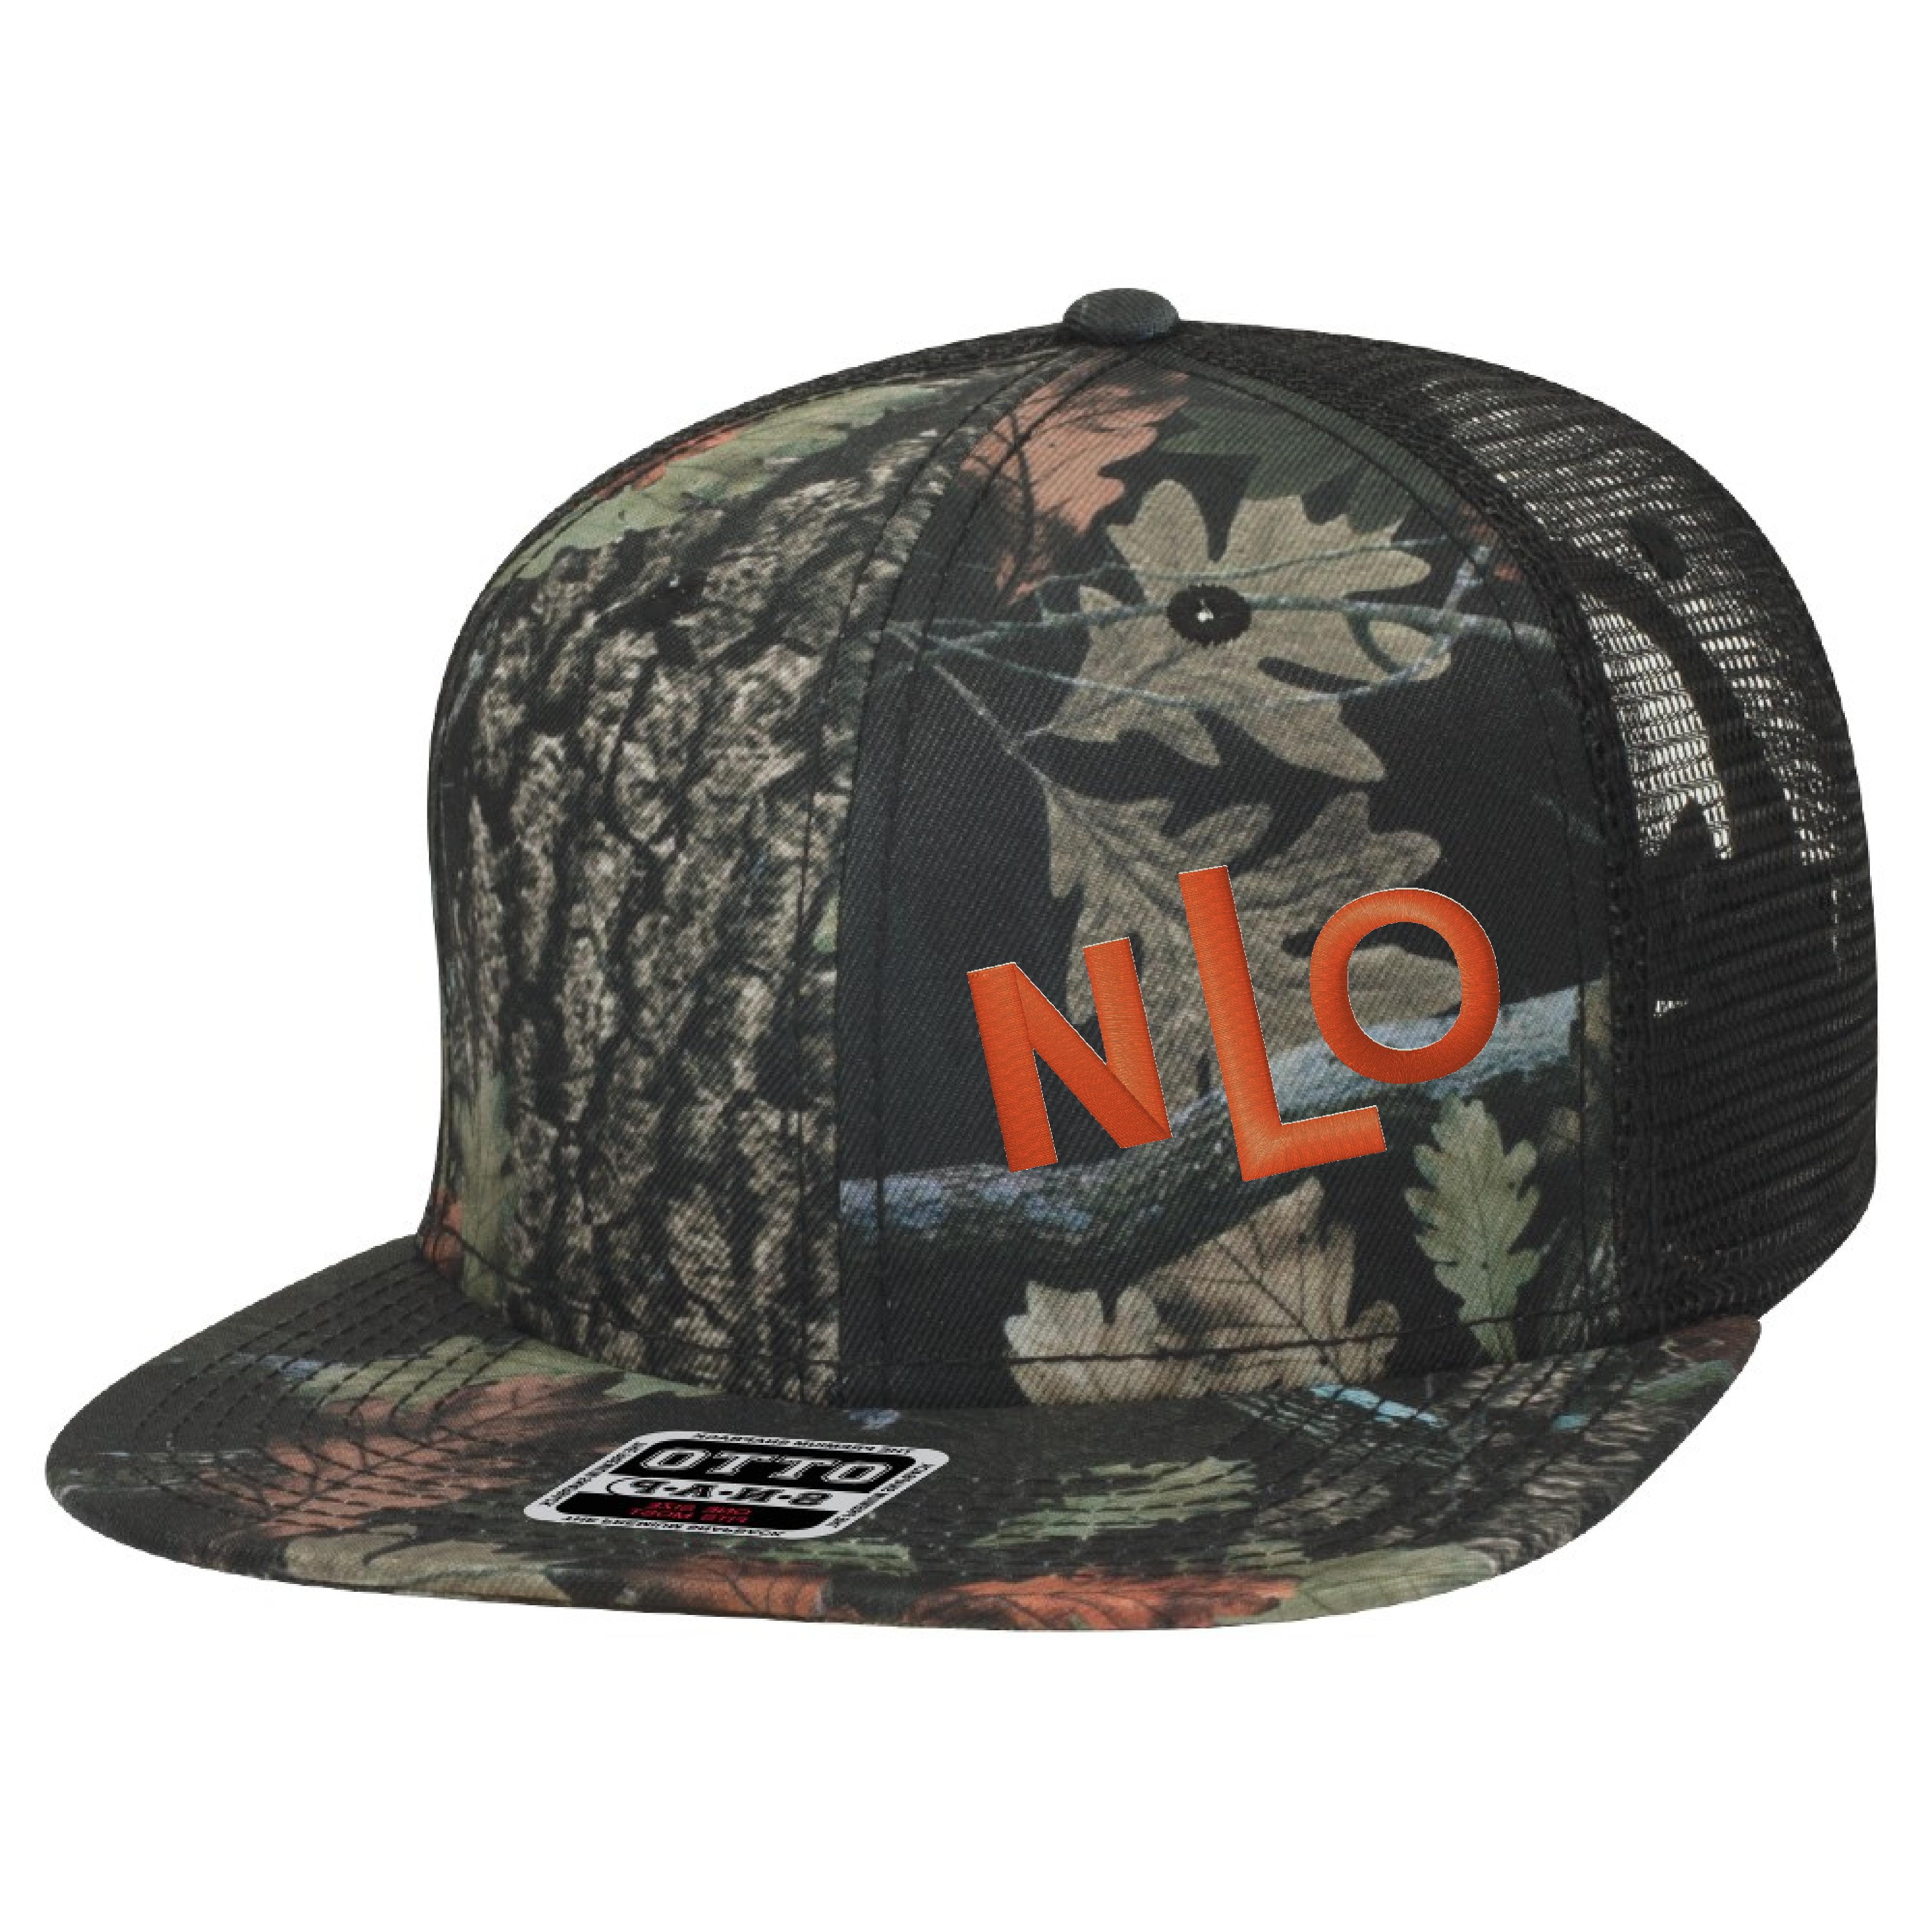 9db063cba NLO Camo Dark and Orange Snapback Trucker Hat